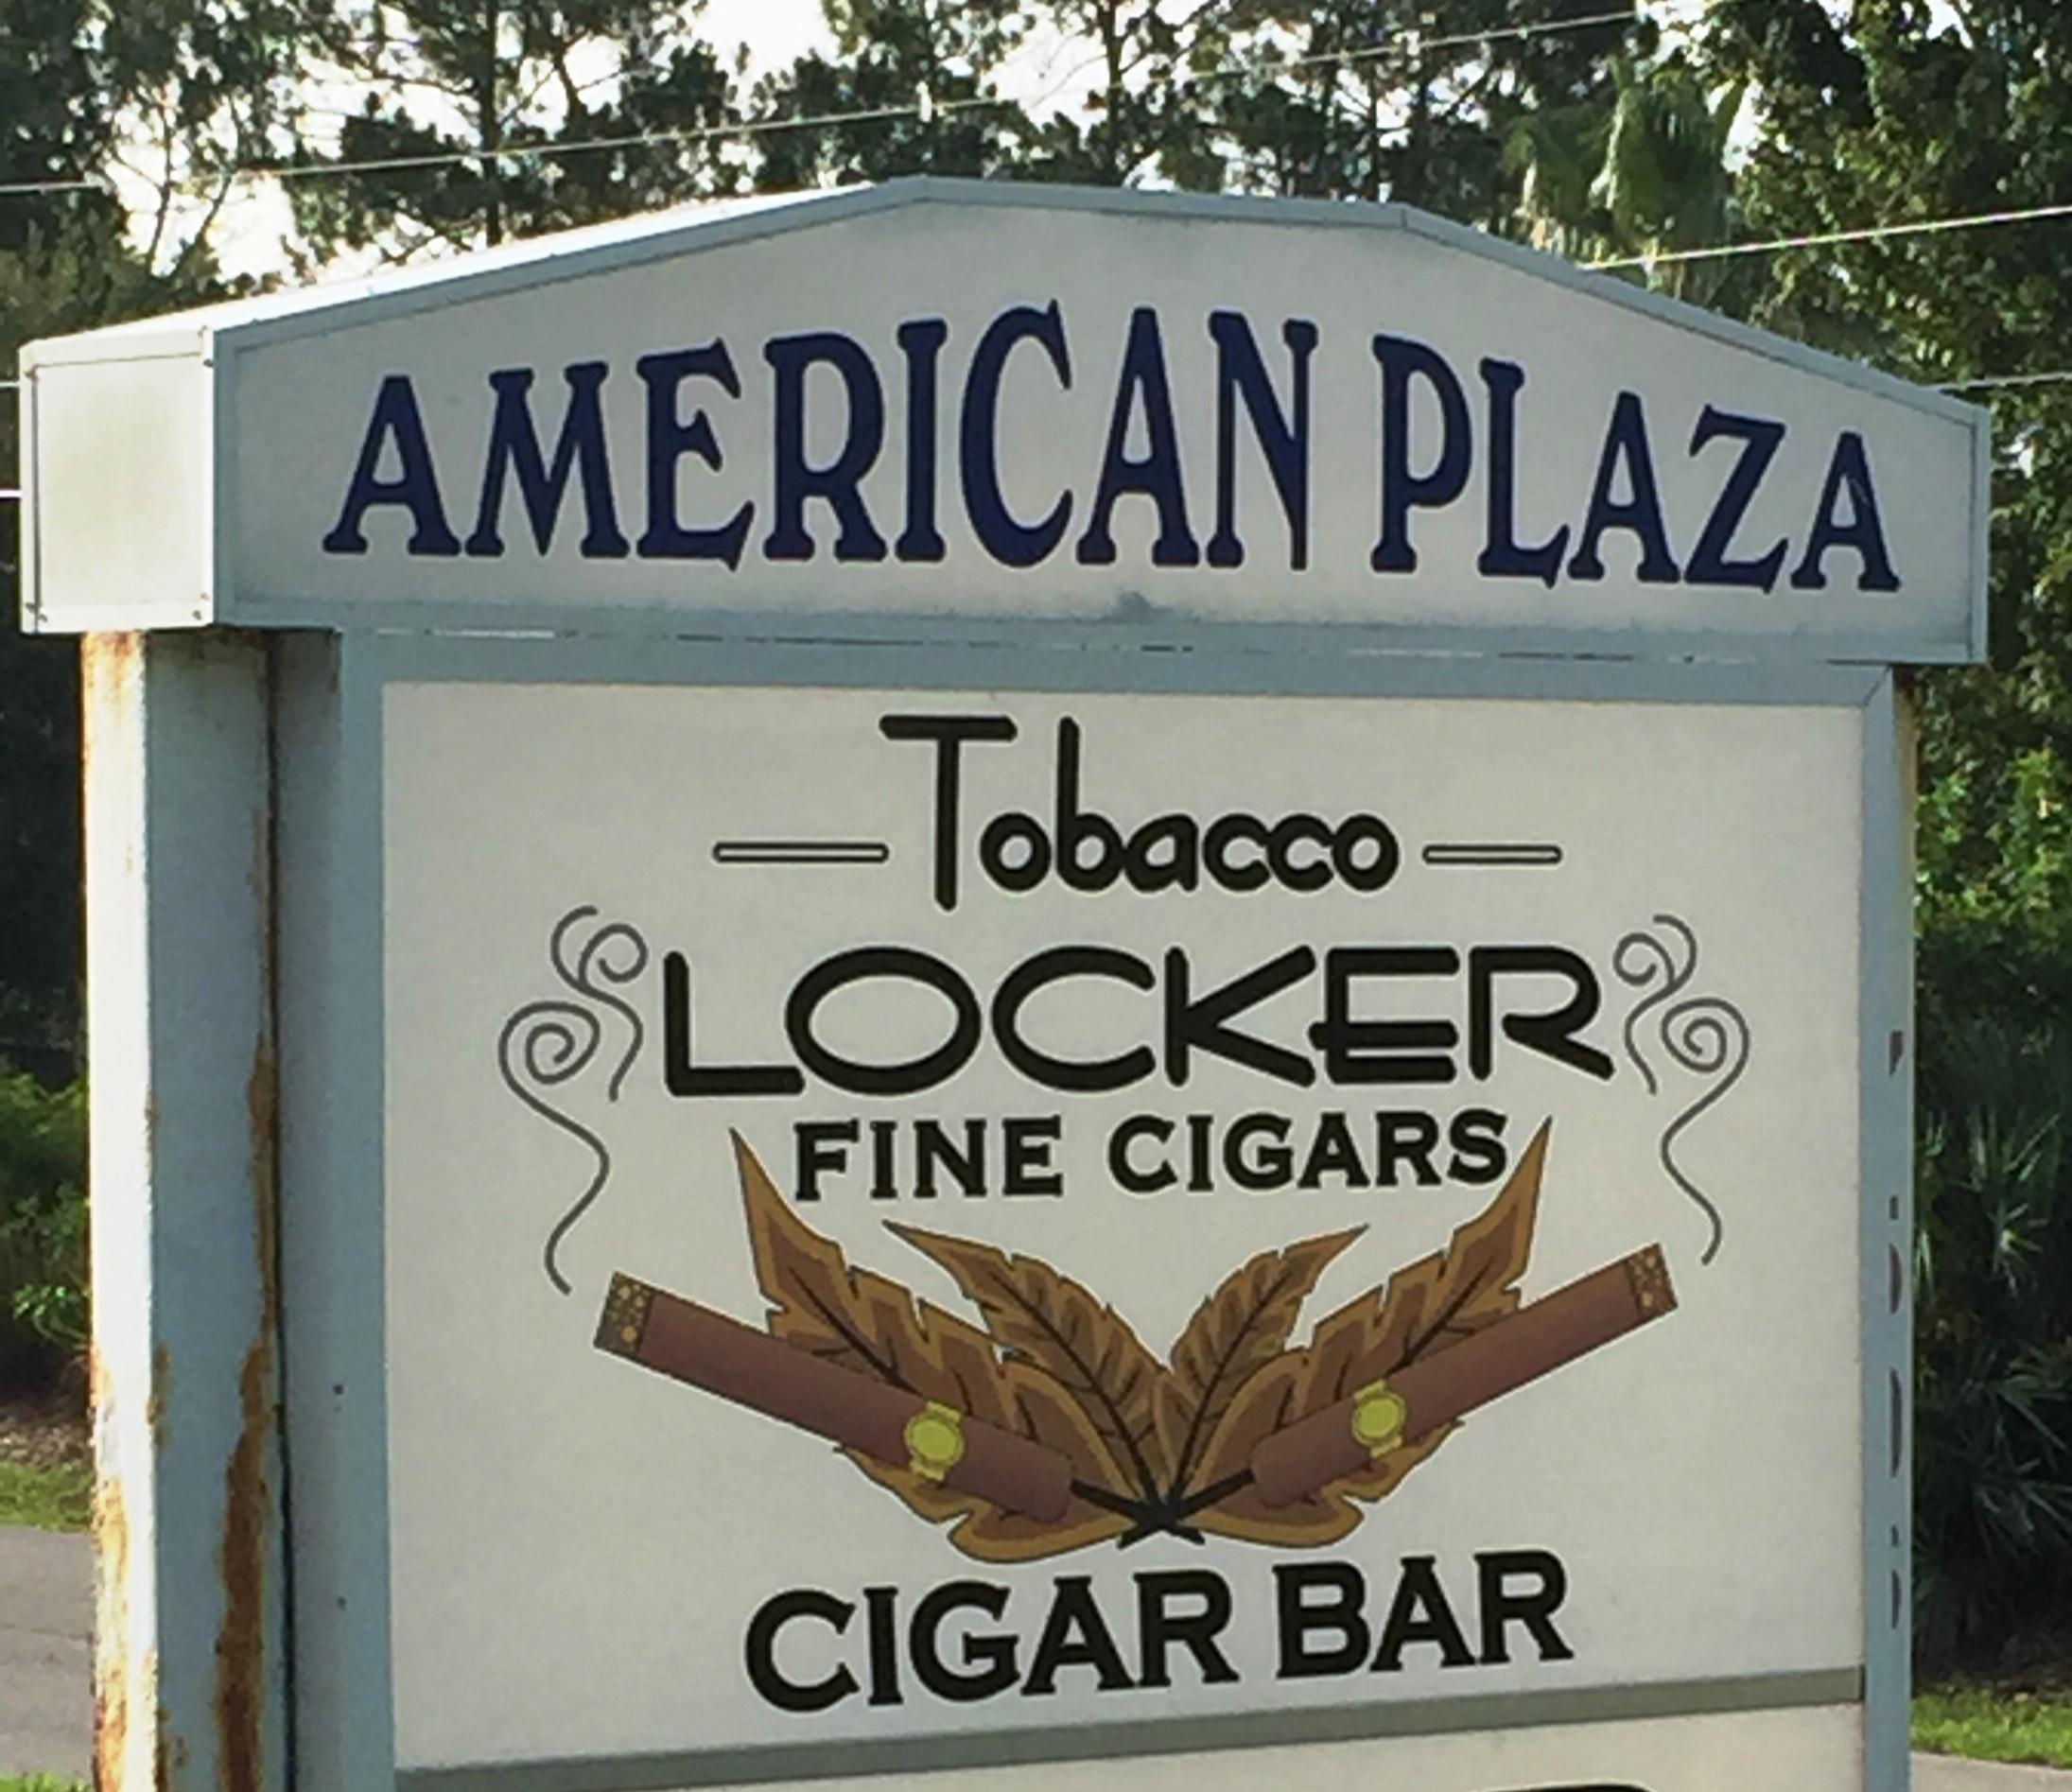 Tobacco Locker Cigar Bar image 2